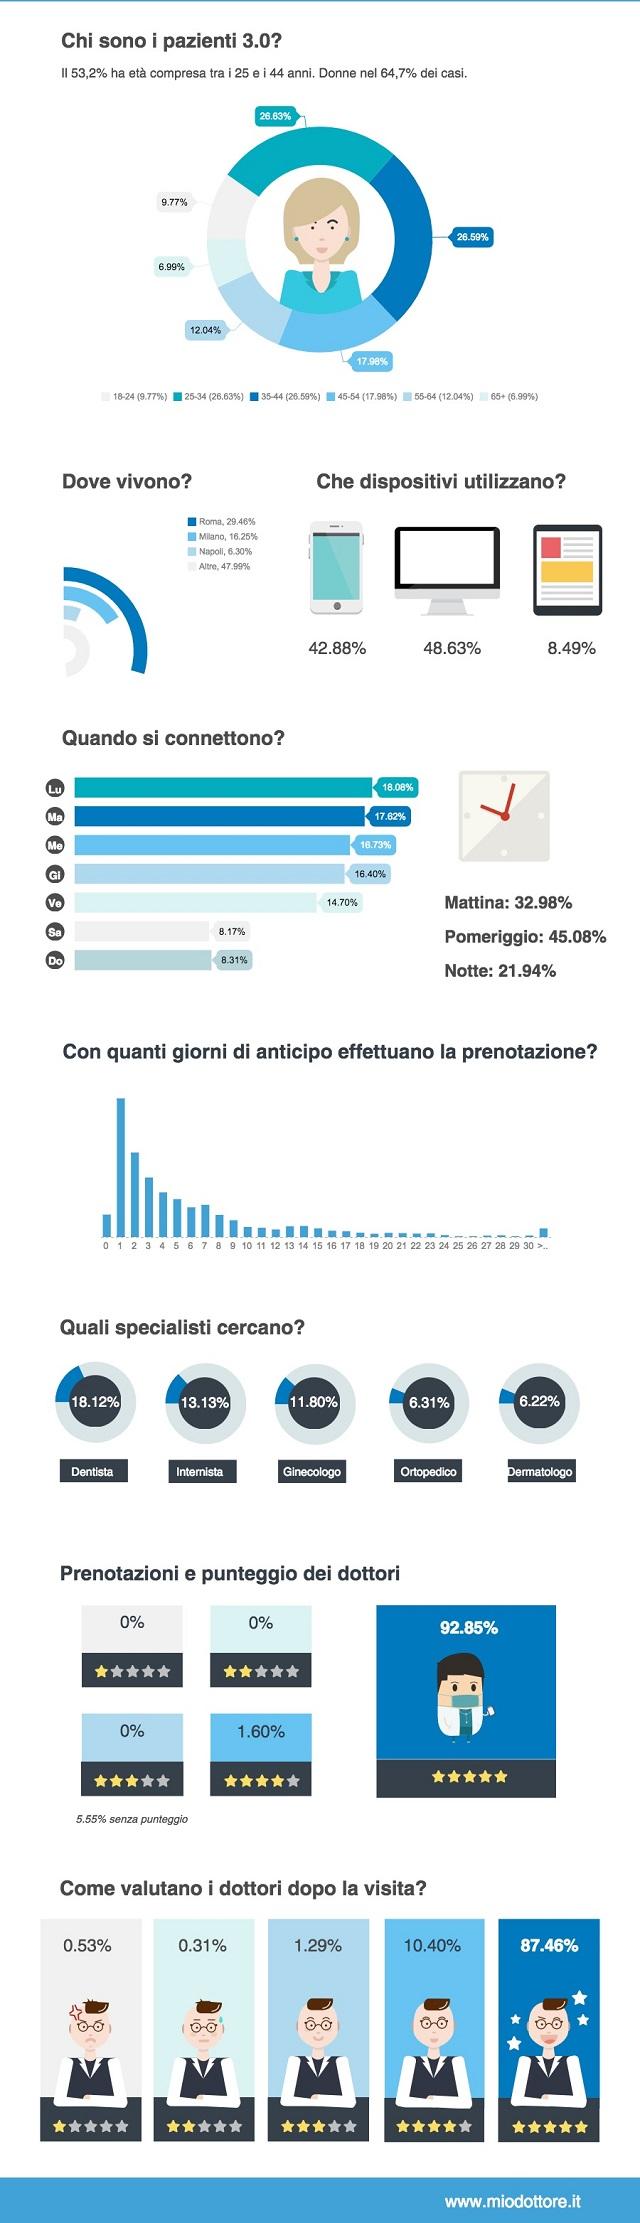 MioDottore.it_Patient Behaviour_infografica